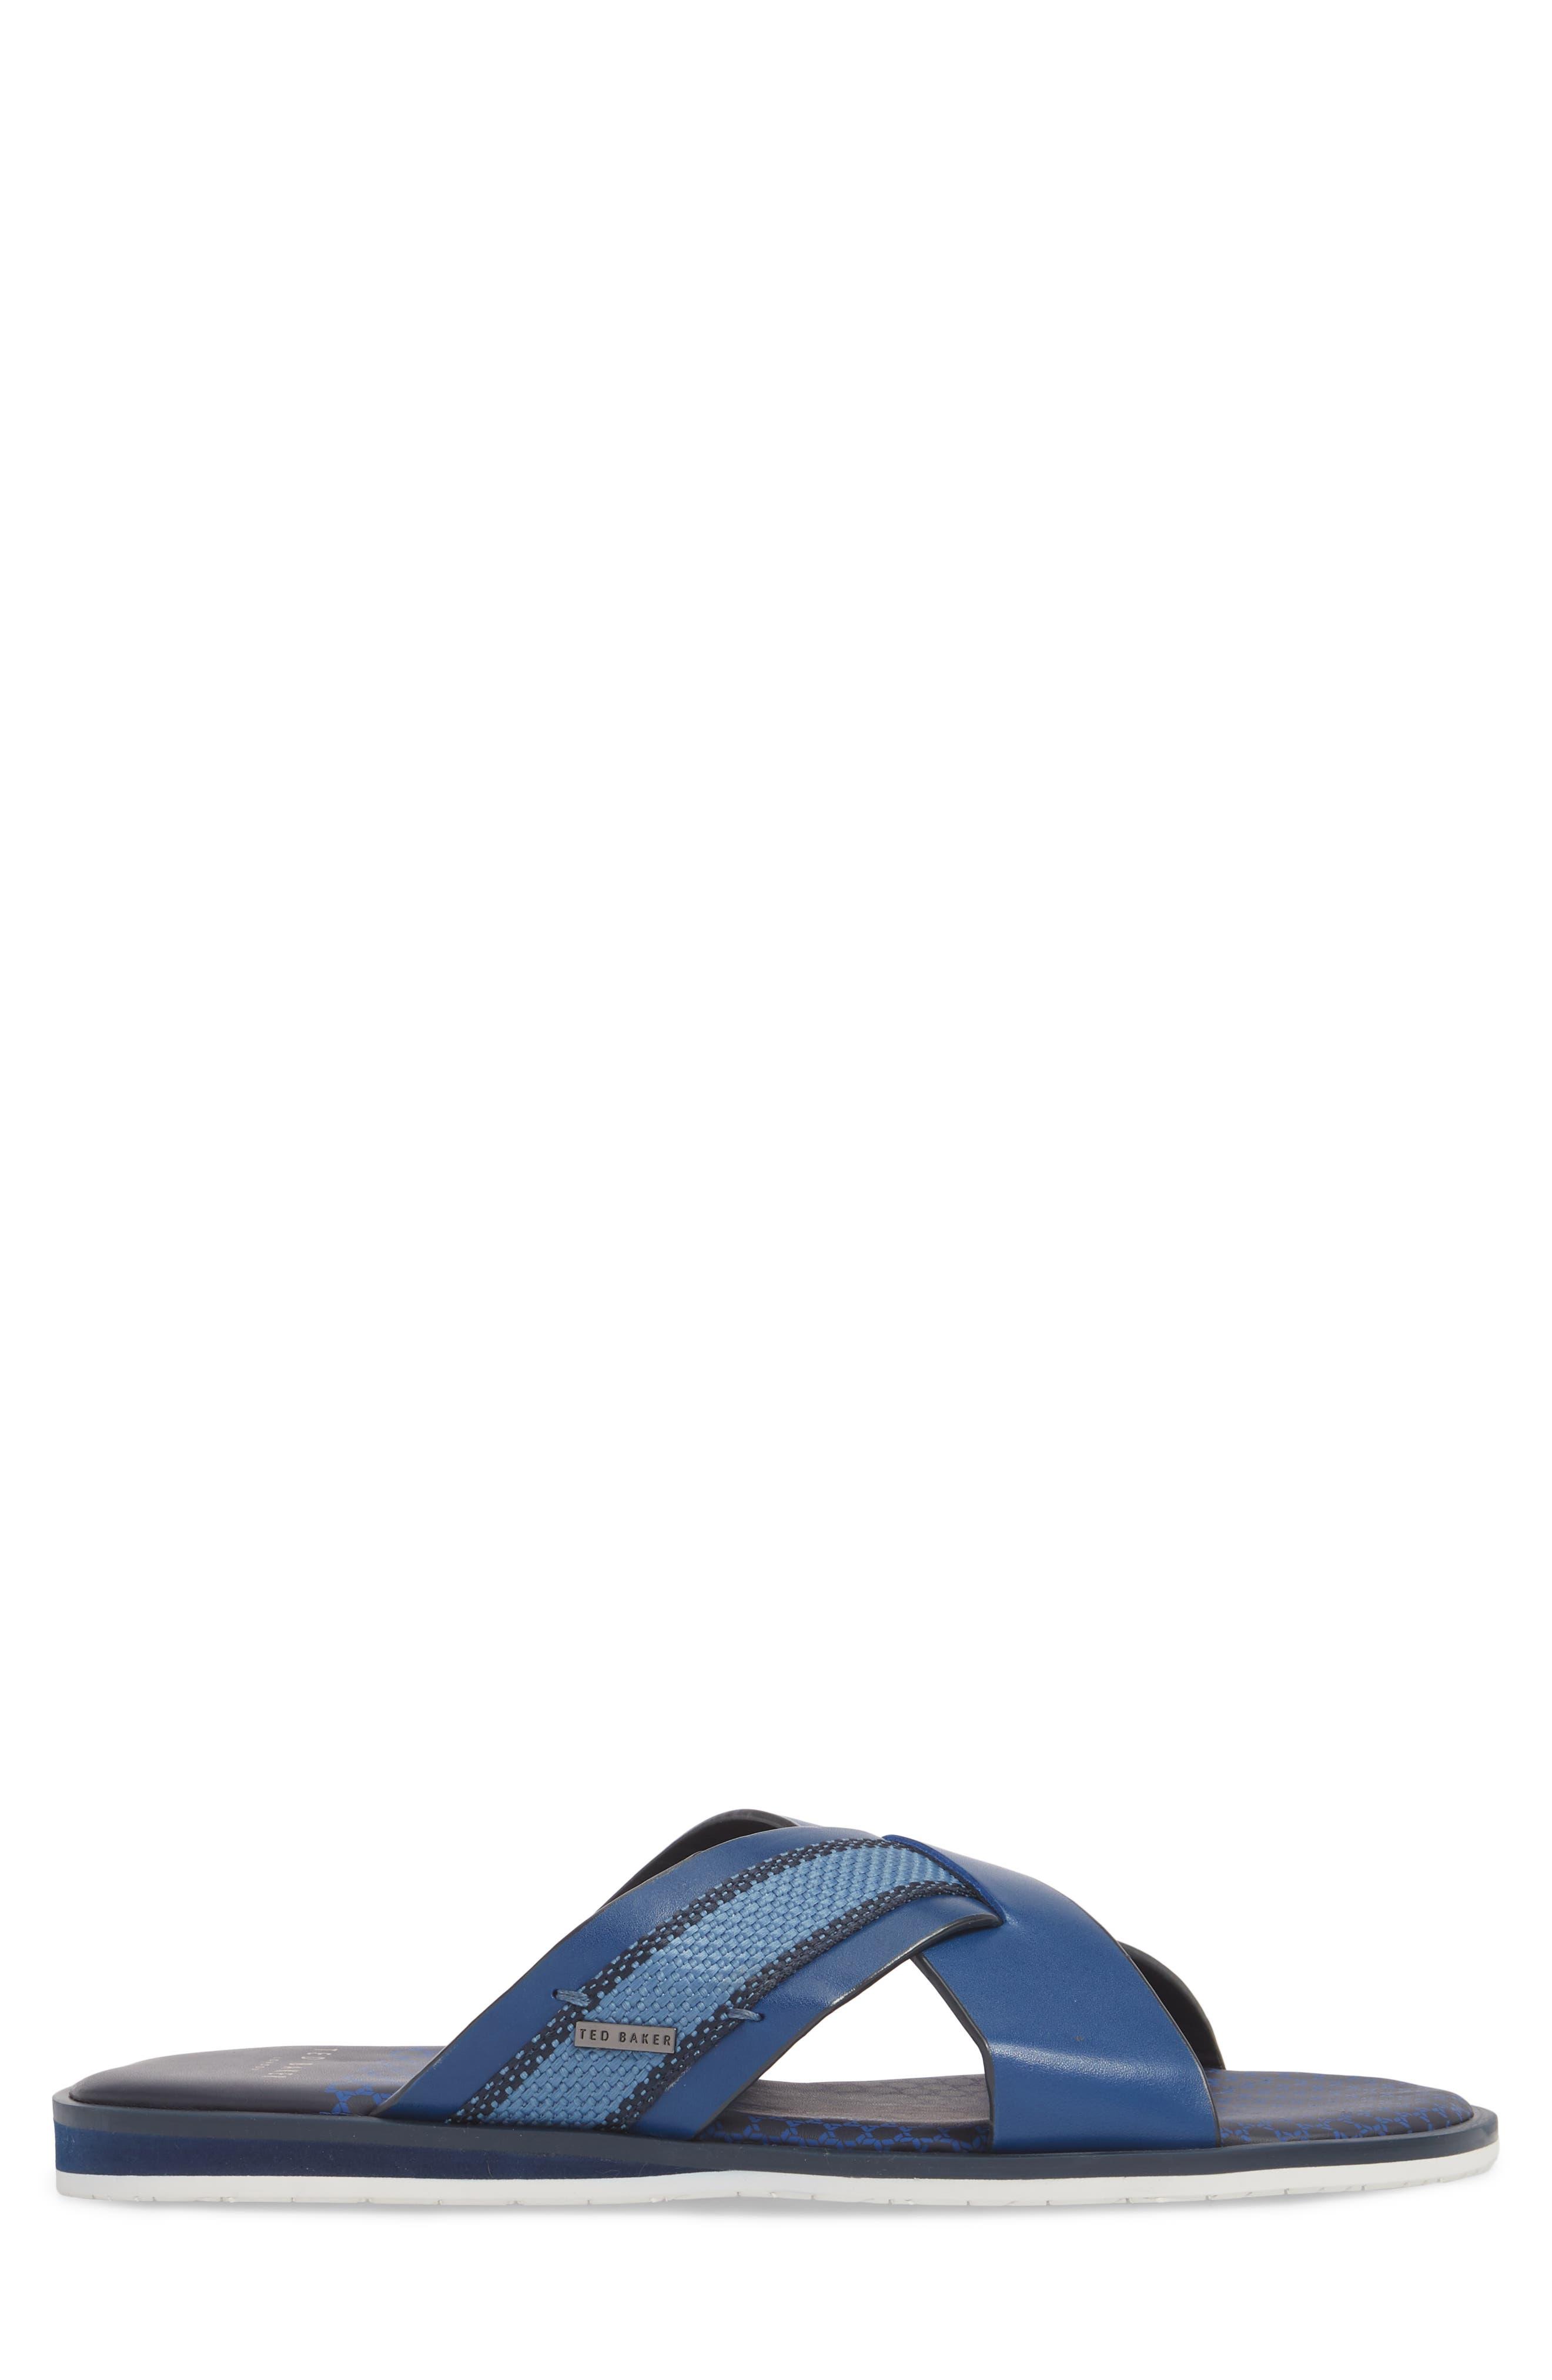 Farrull Cross Strap Slide Sandal,                             Alternate thumbnail 3, color,                             BLUE LEATHER/TEXTILE